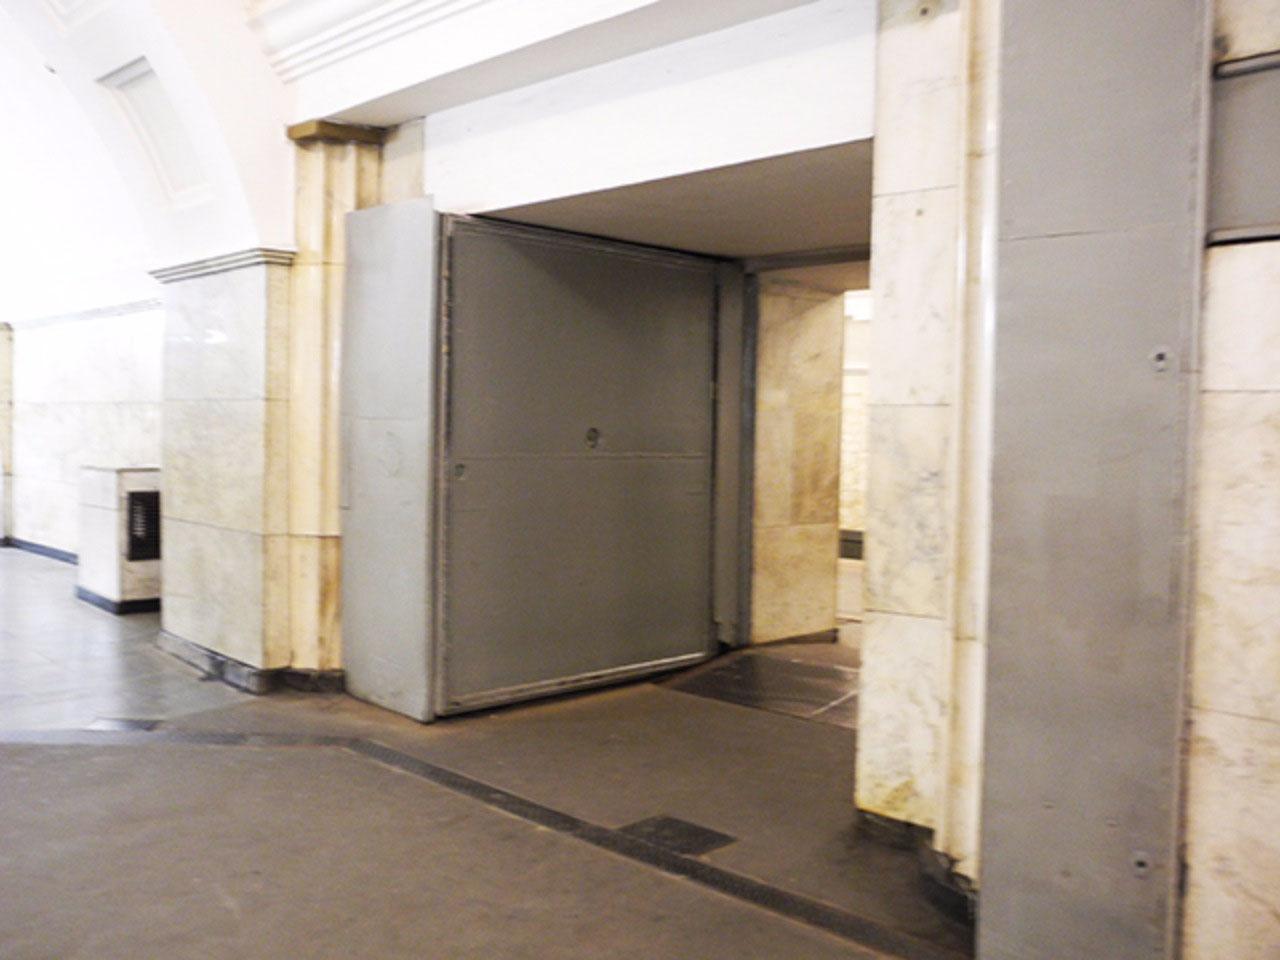 Blast doors at Mayakovskaya station